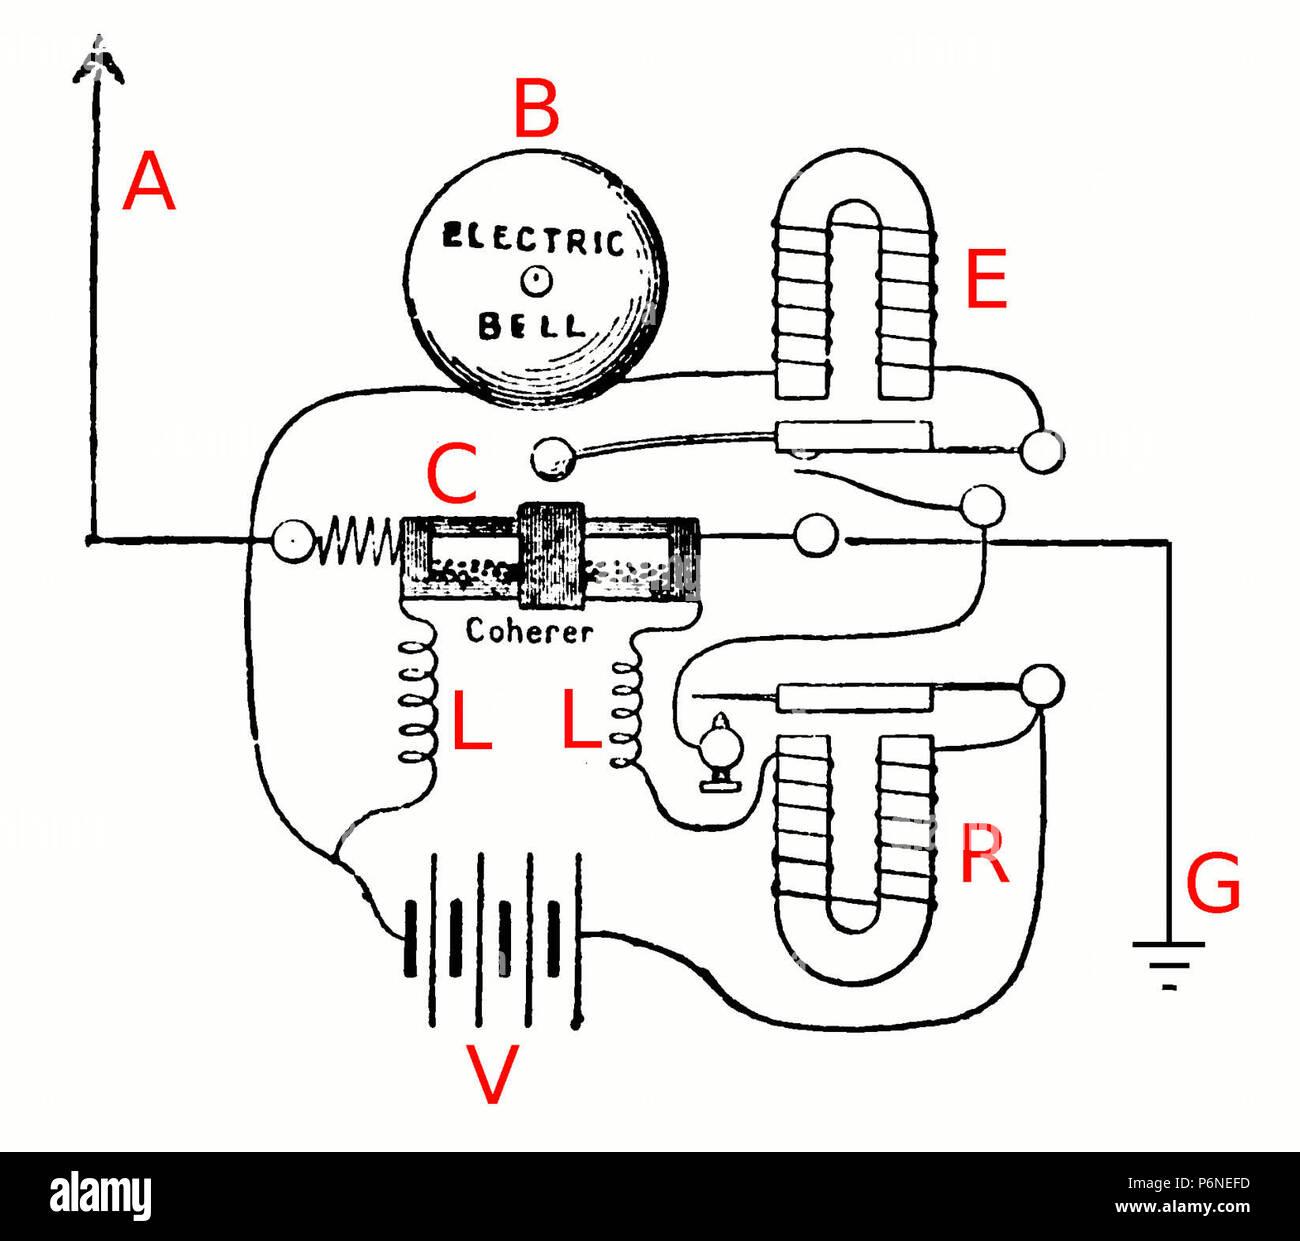 Superb Circuit Of Popovs Lightning Detector Stock Photo 210684753 Alamy Wiring Database Rimengelartorg